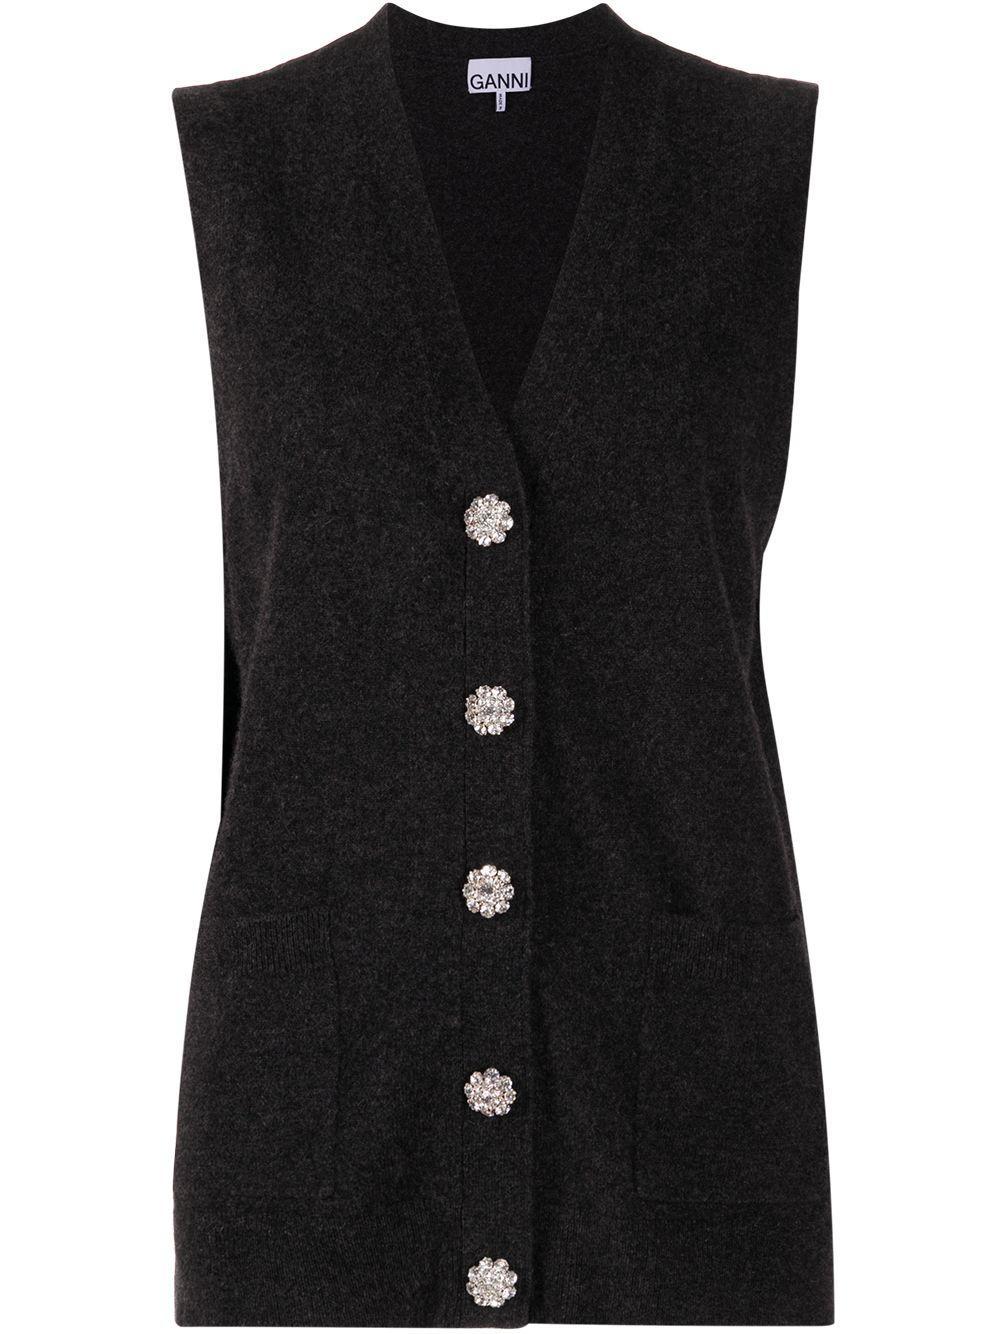 Cashmere Knit Sweater Vest Item # K1412